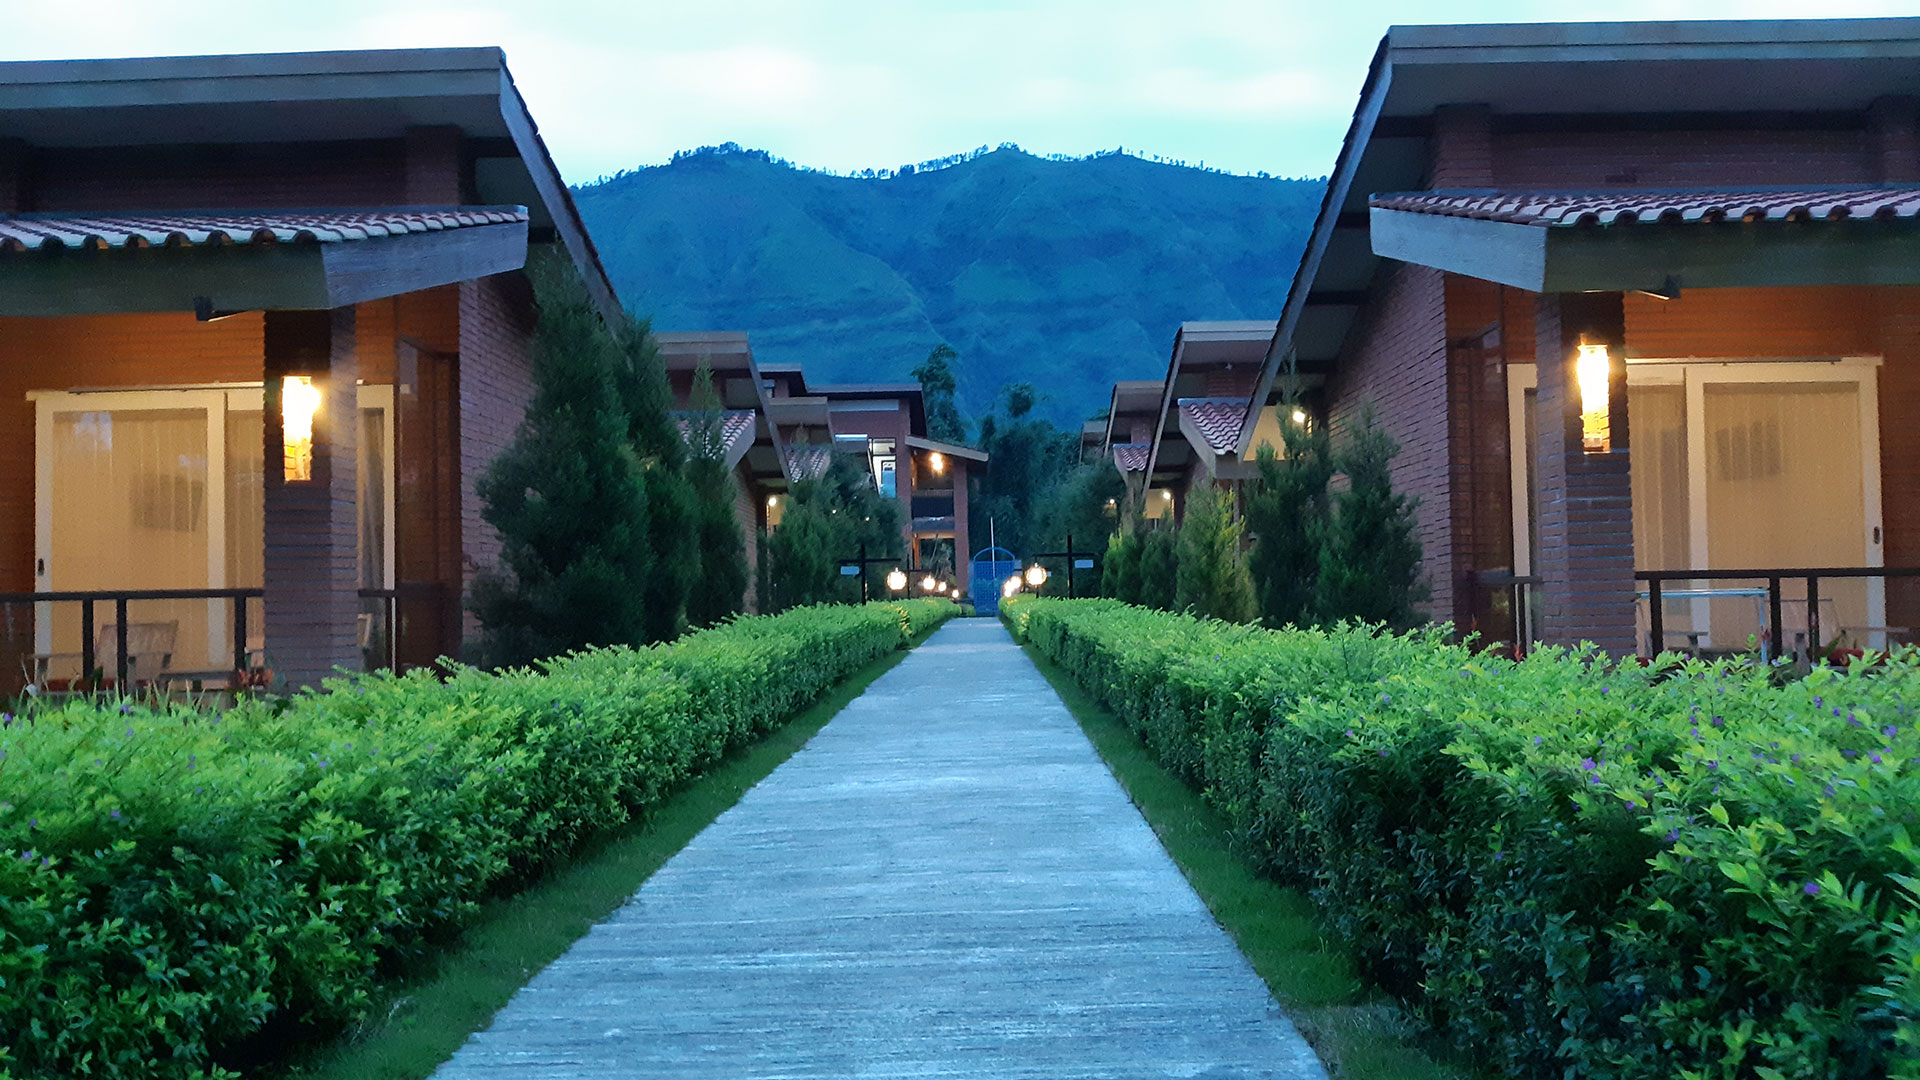 3. Bromo Terrace Hotel